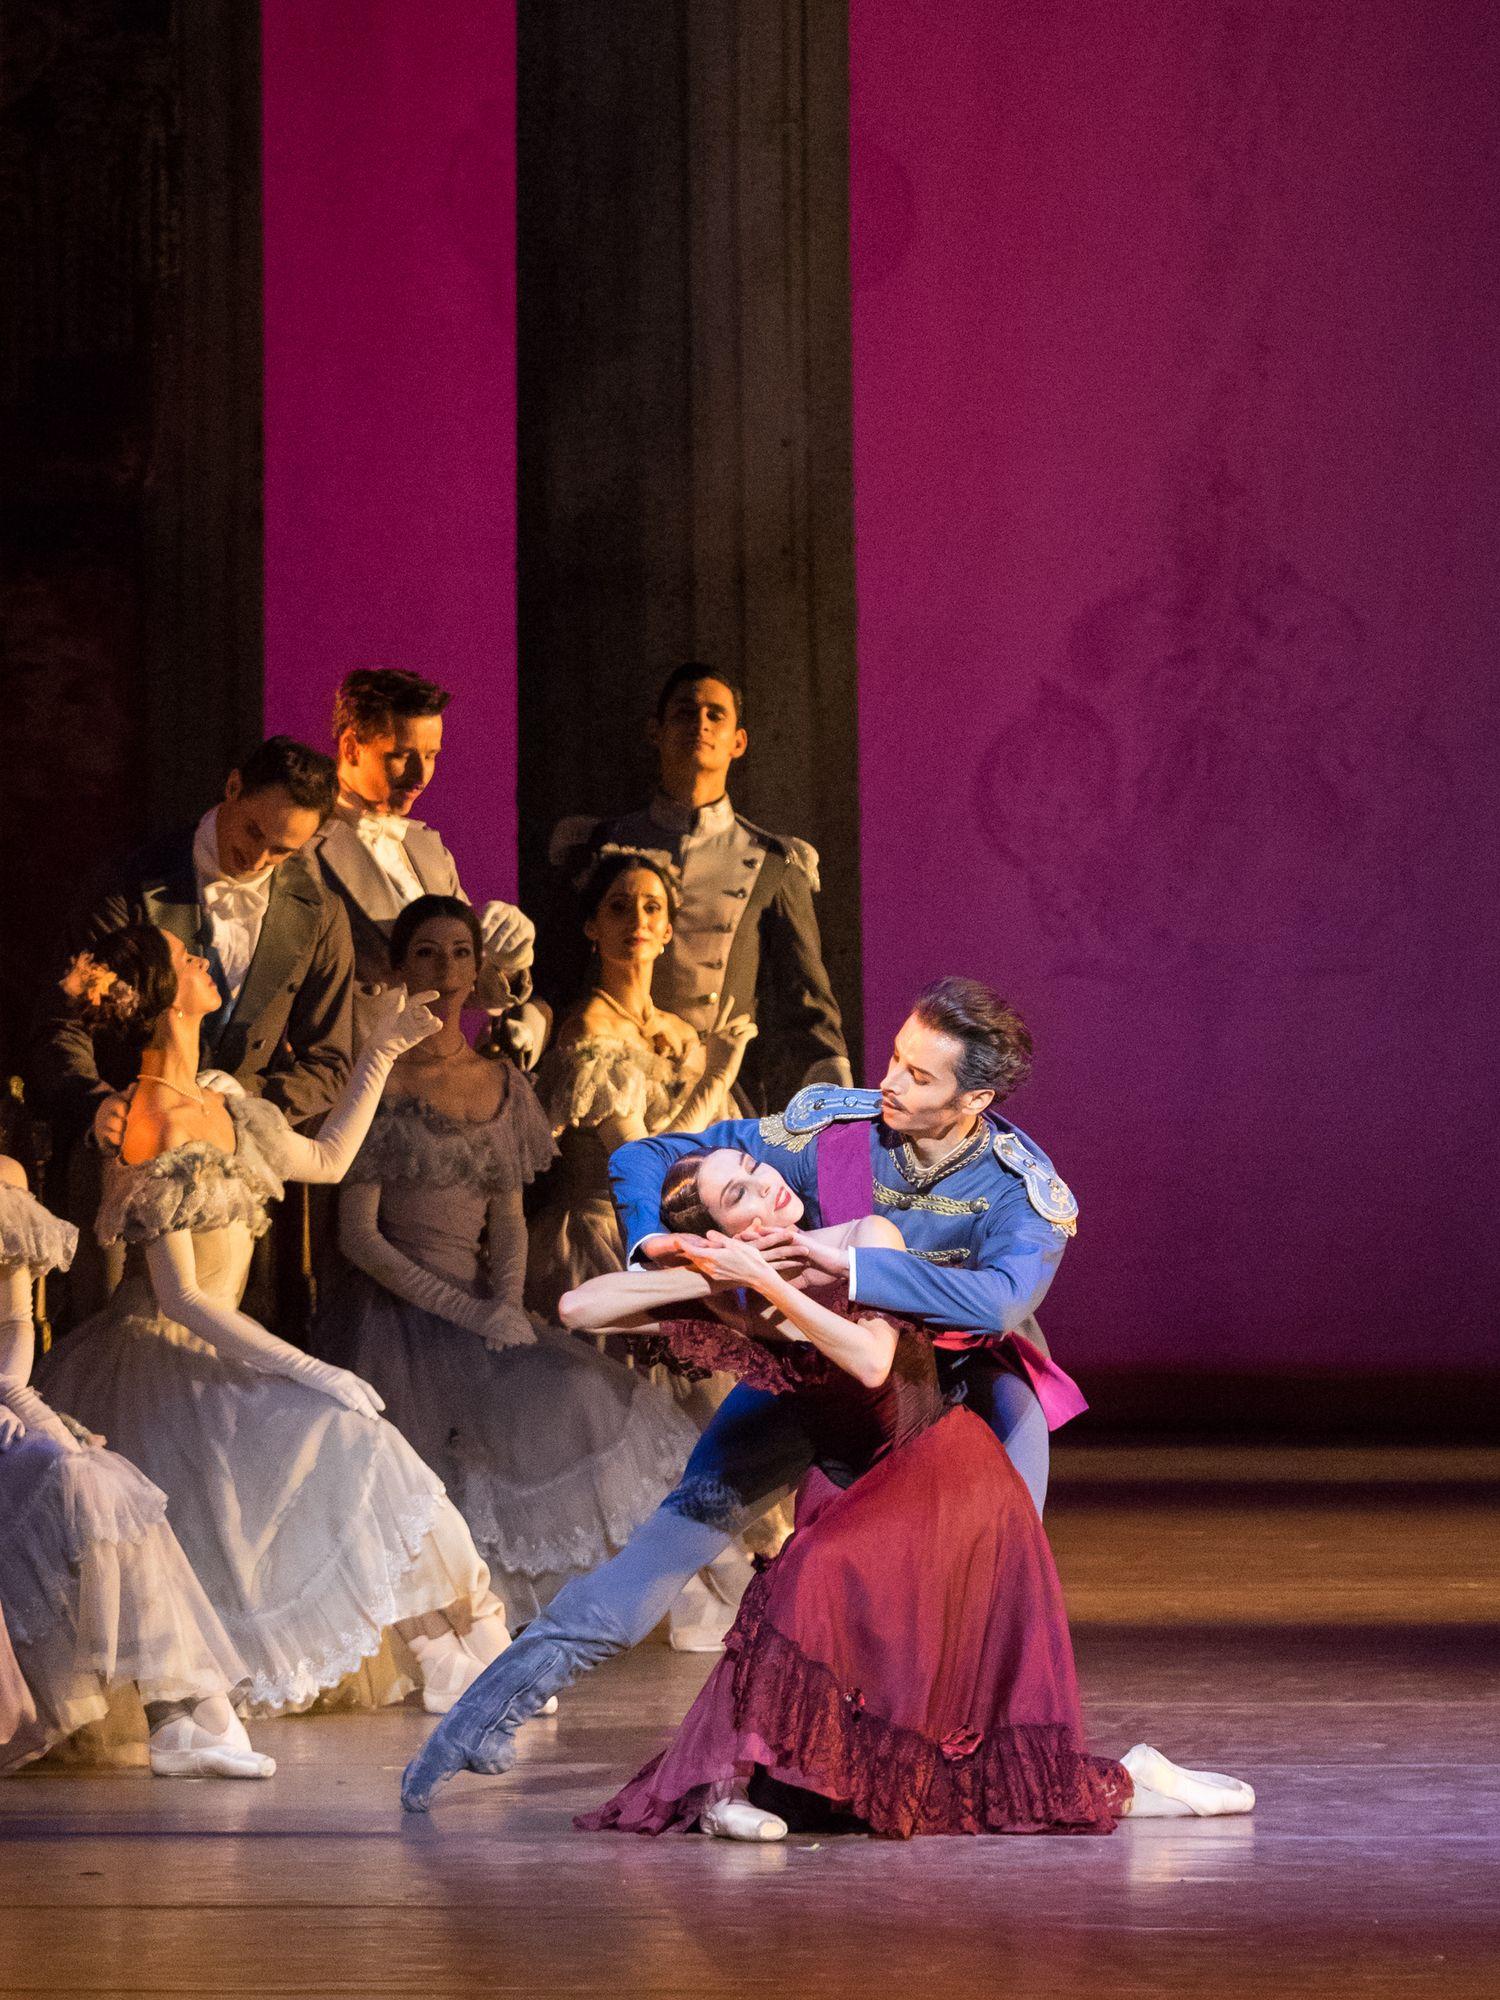 Alexandru Tcacenco/Maria Yakovleva: Copyright Wiener Staatsoper/Ashley Taylor